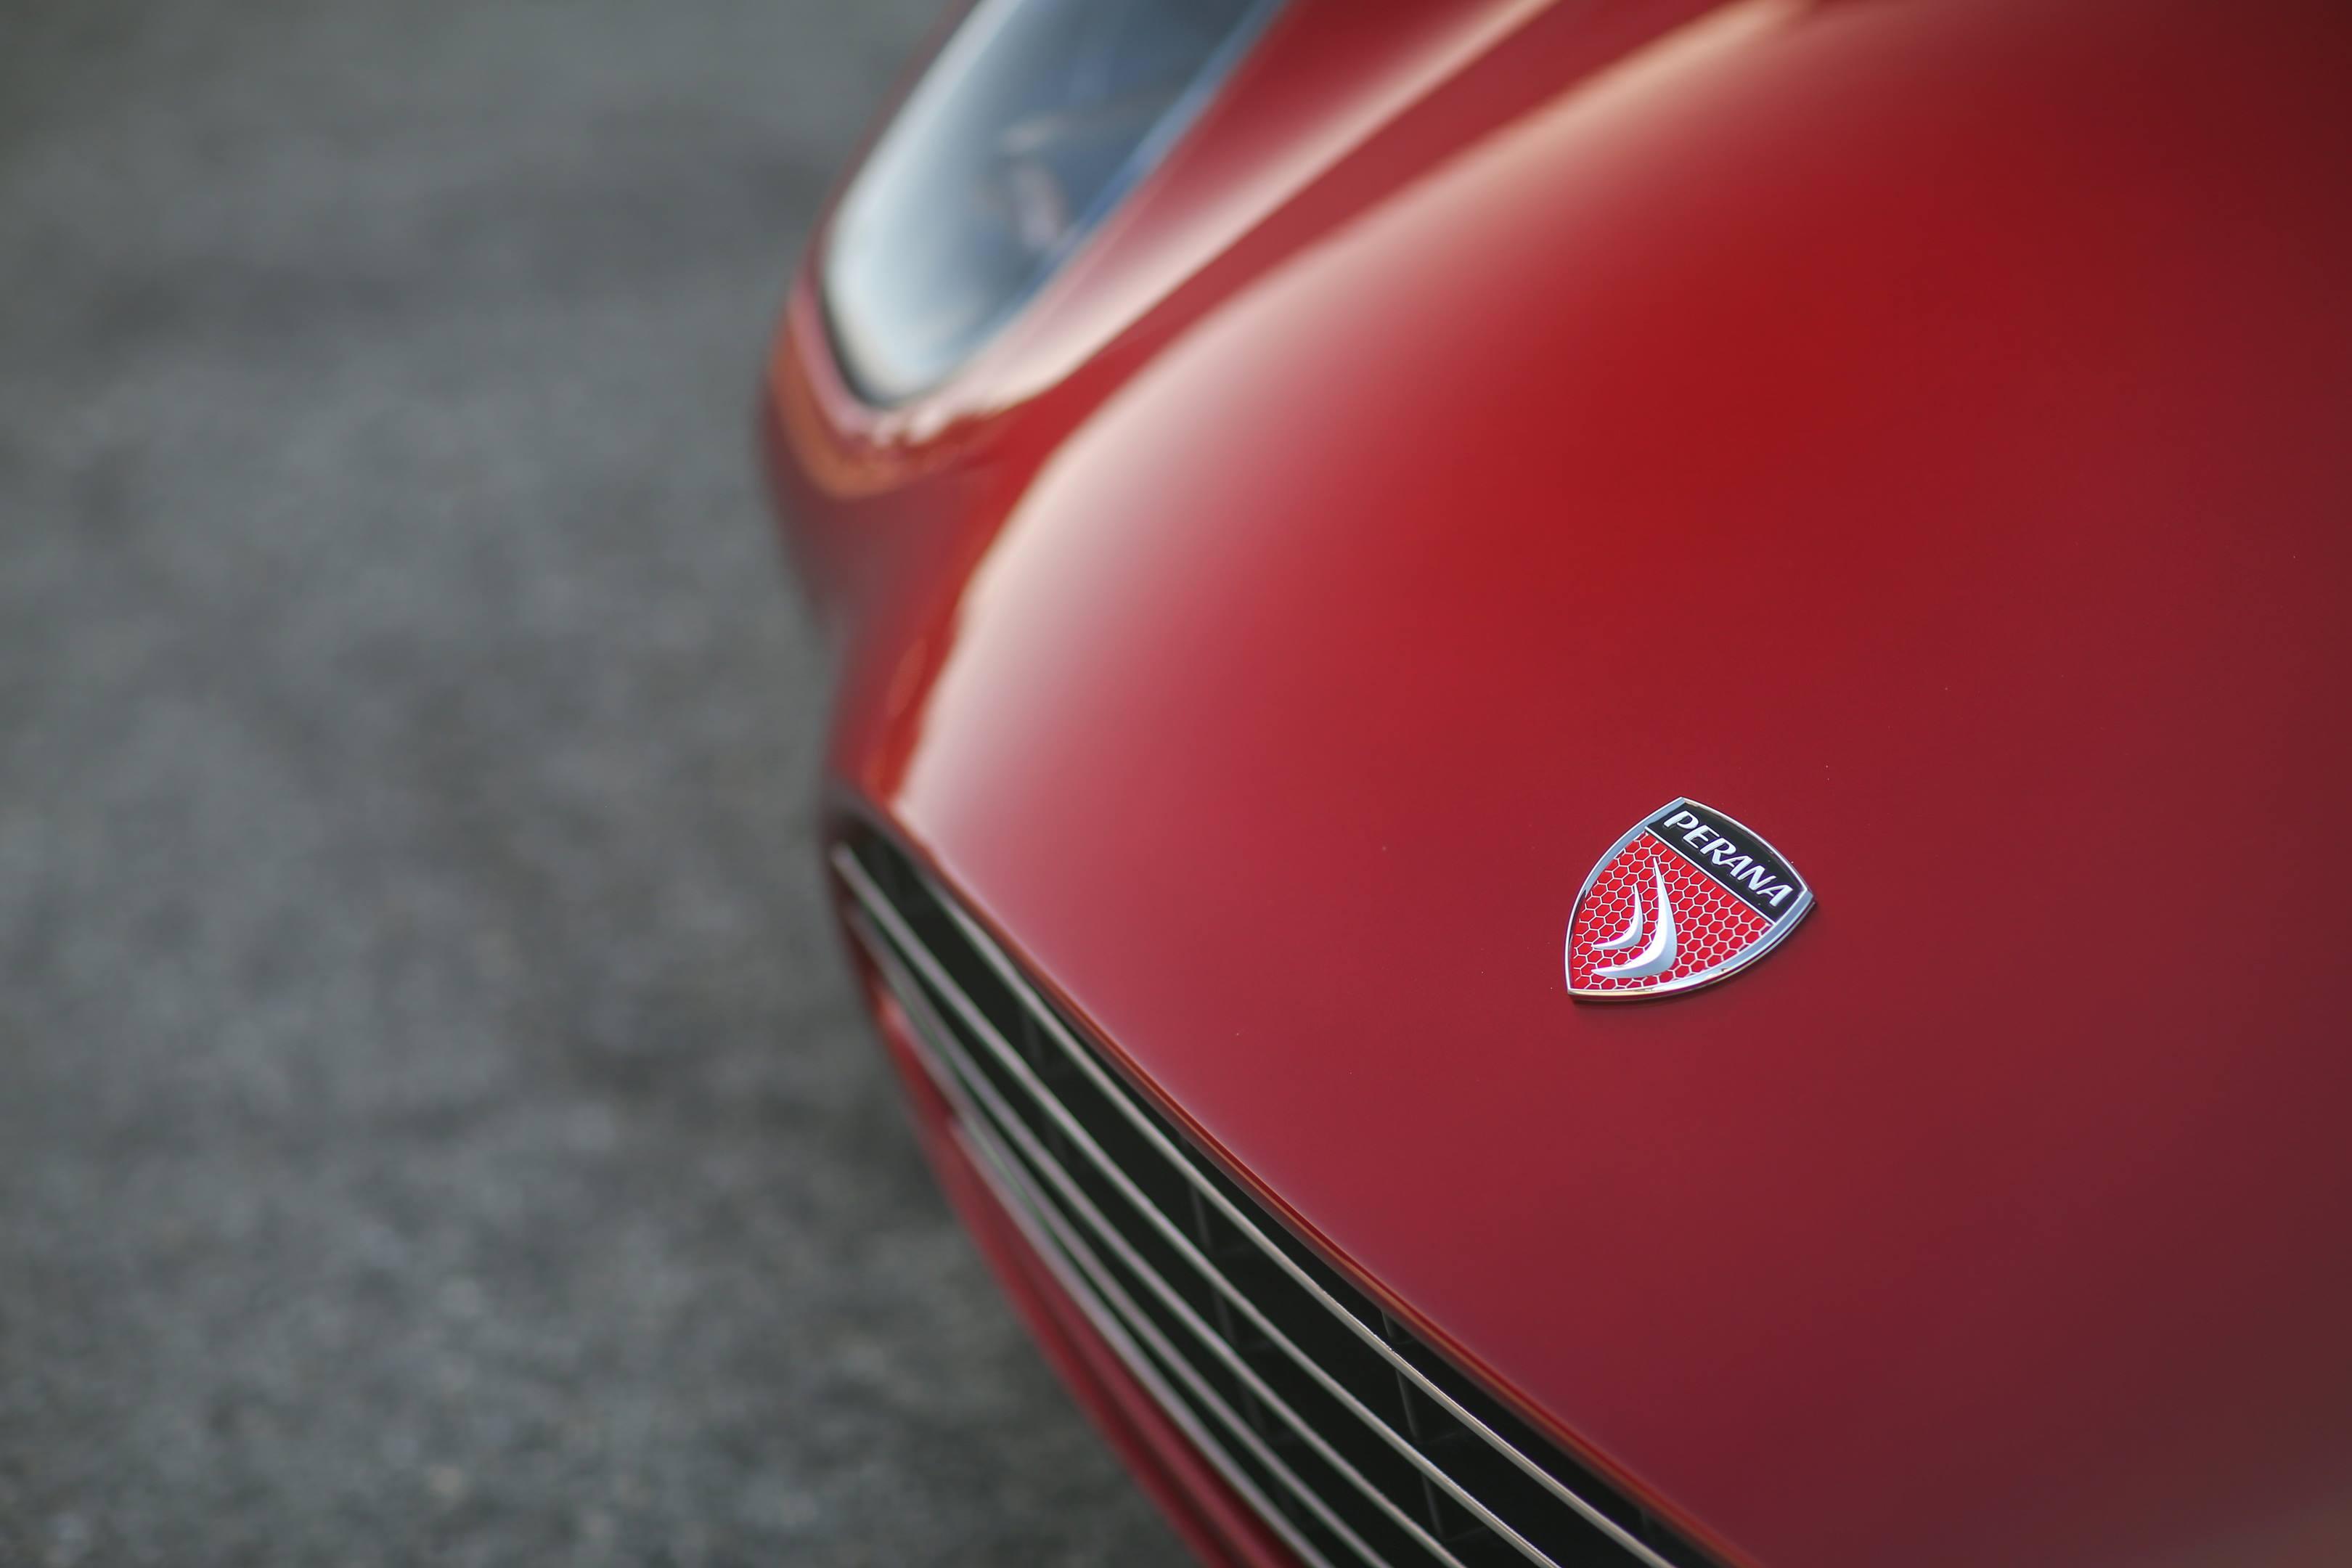 Zagato Perana Z-One badge detail